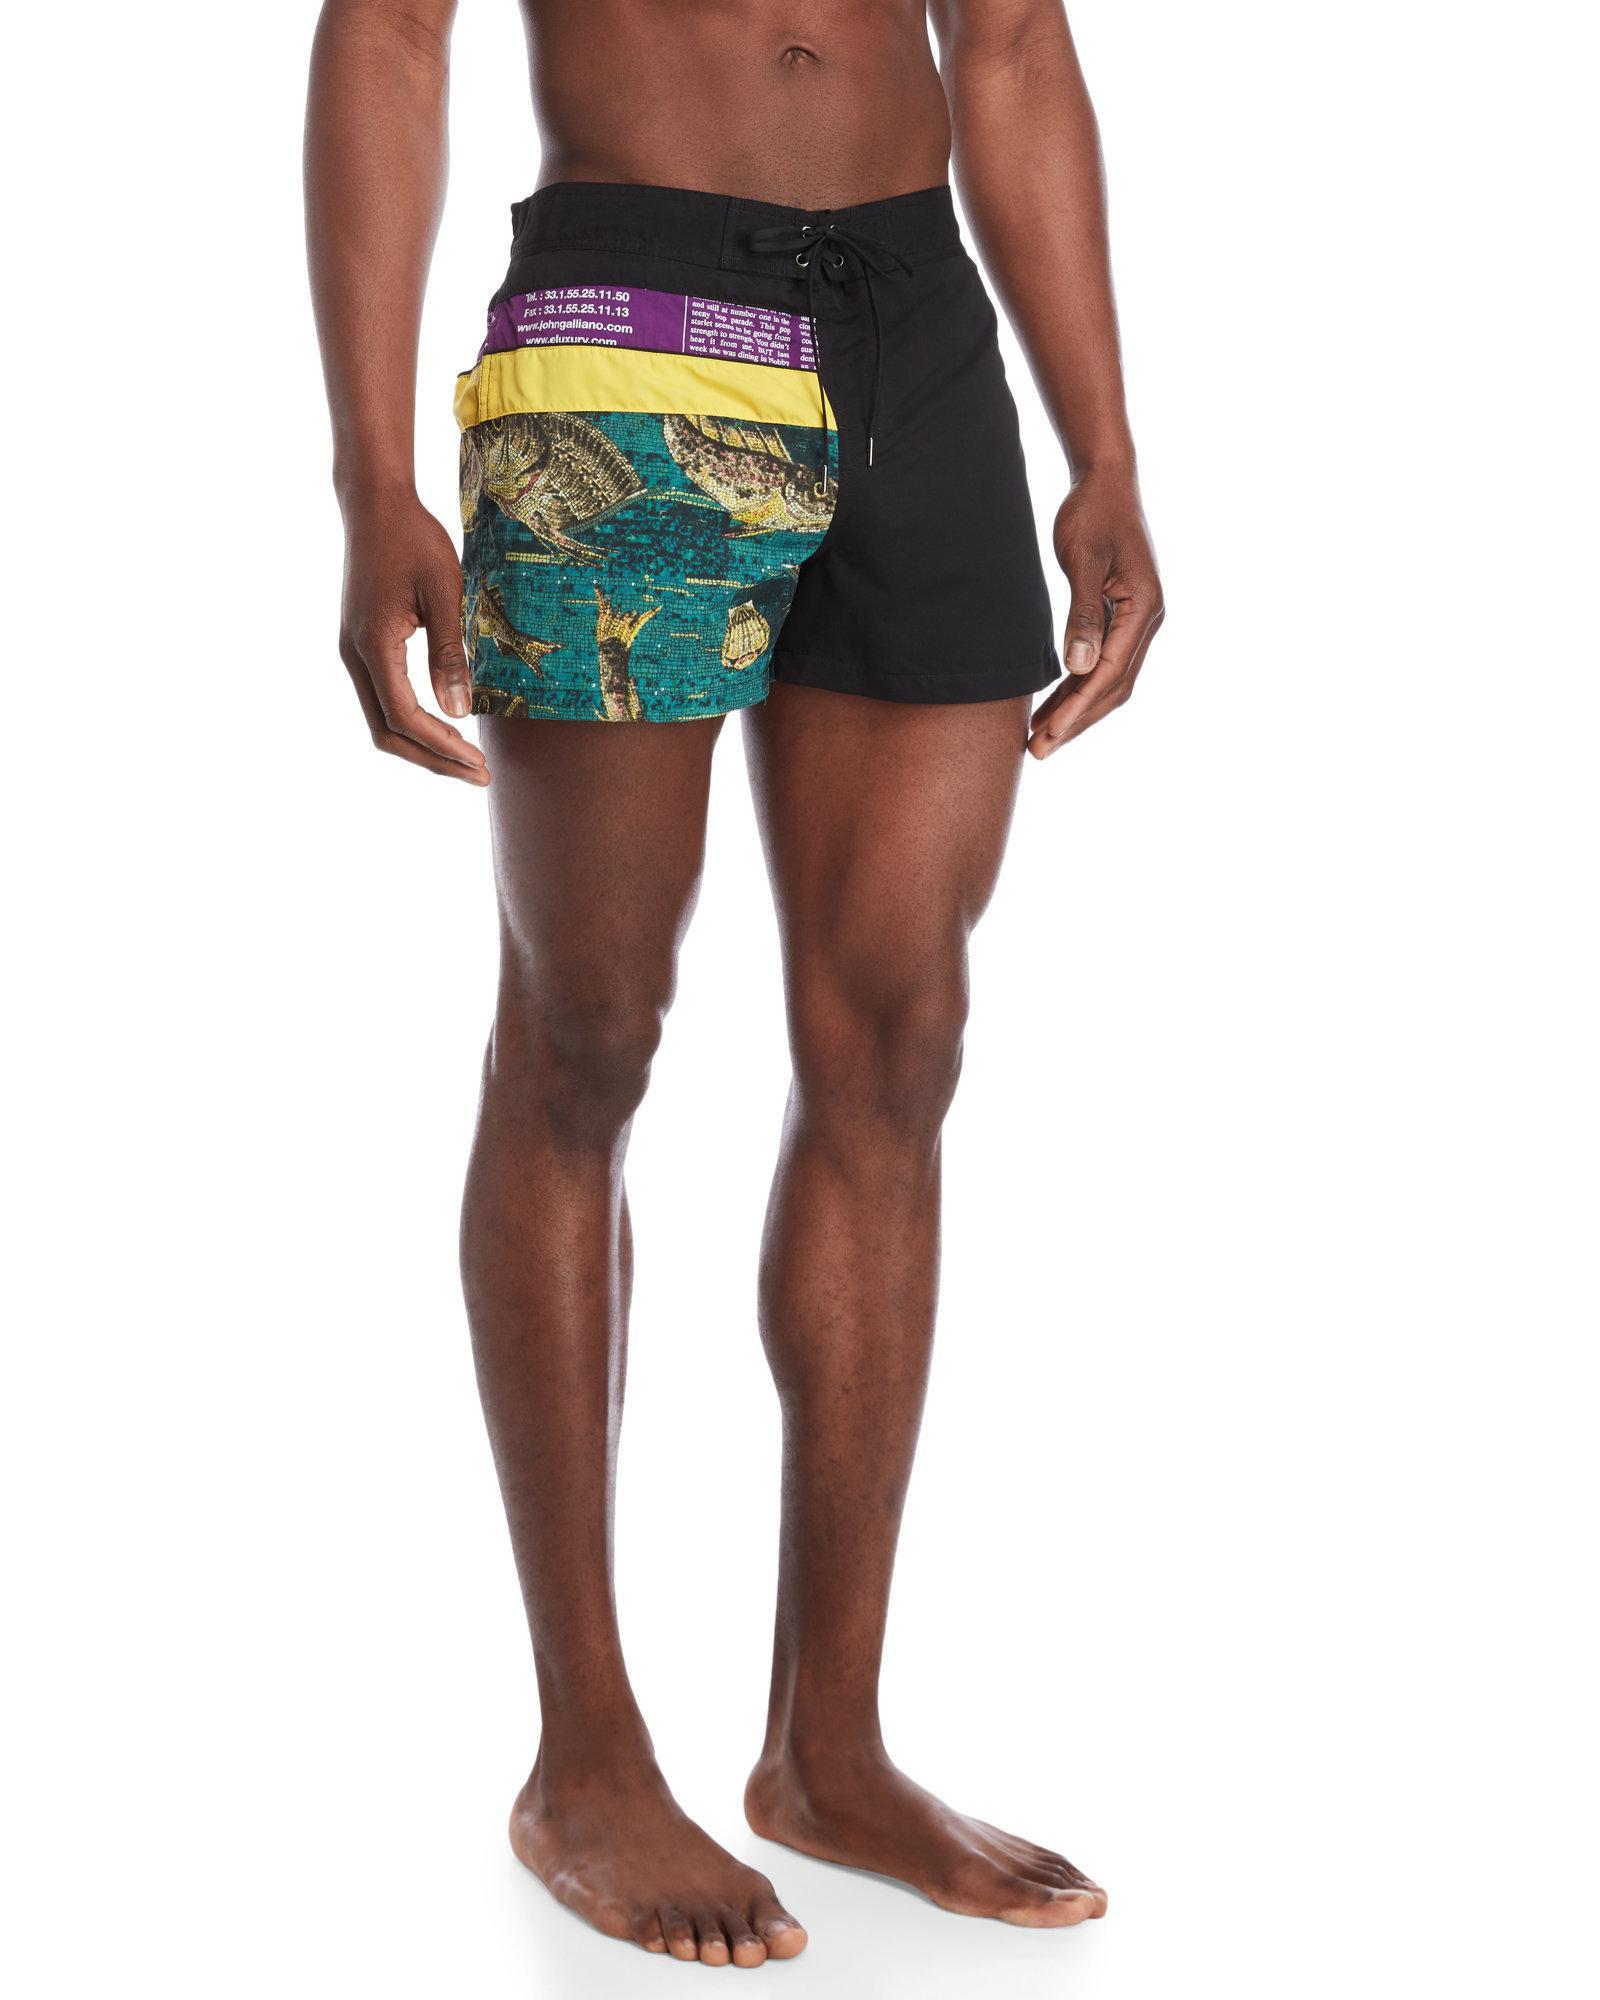 cb90f5593d John Galliano Mosaic Fish Print Swim Shorts in Black for Men - Lyst